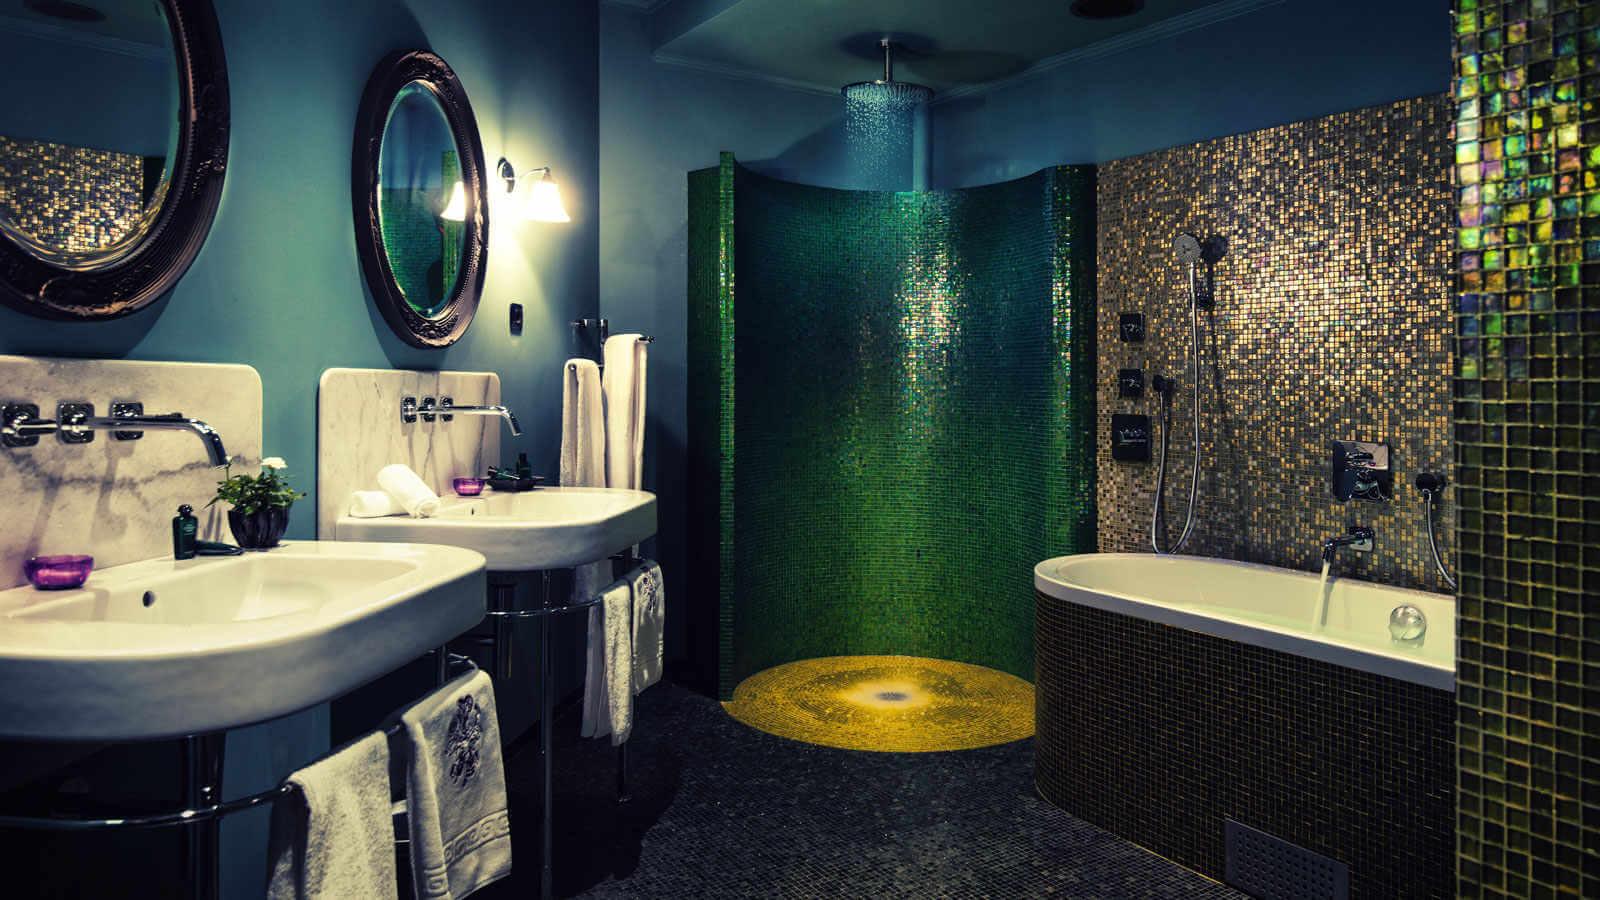 Dorsia Hotel Bathroom